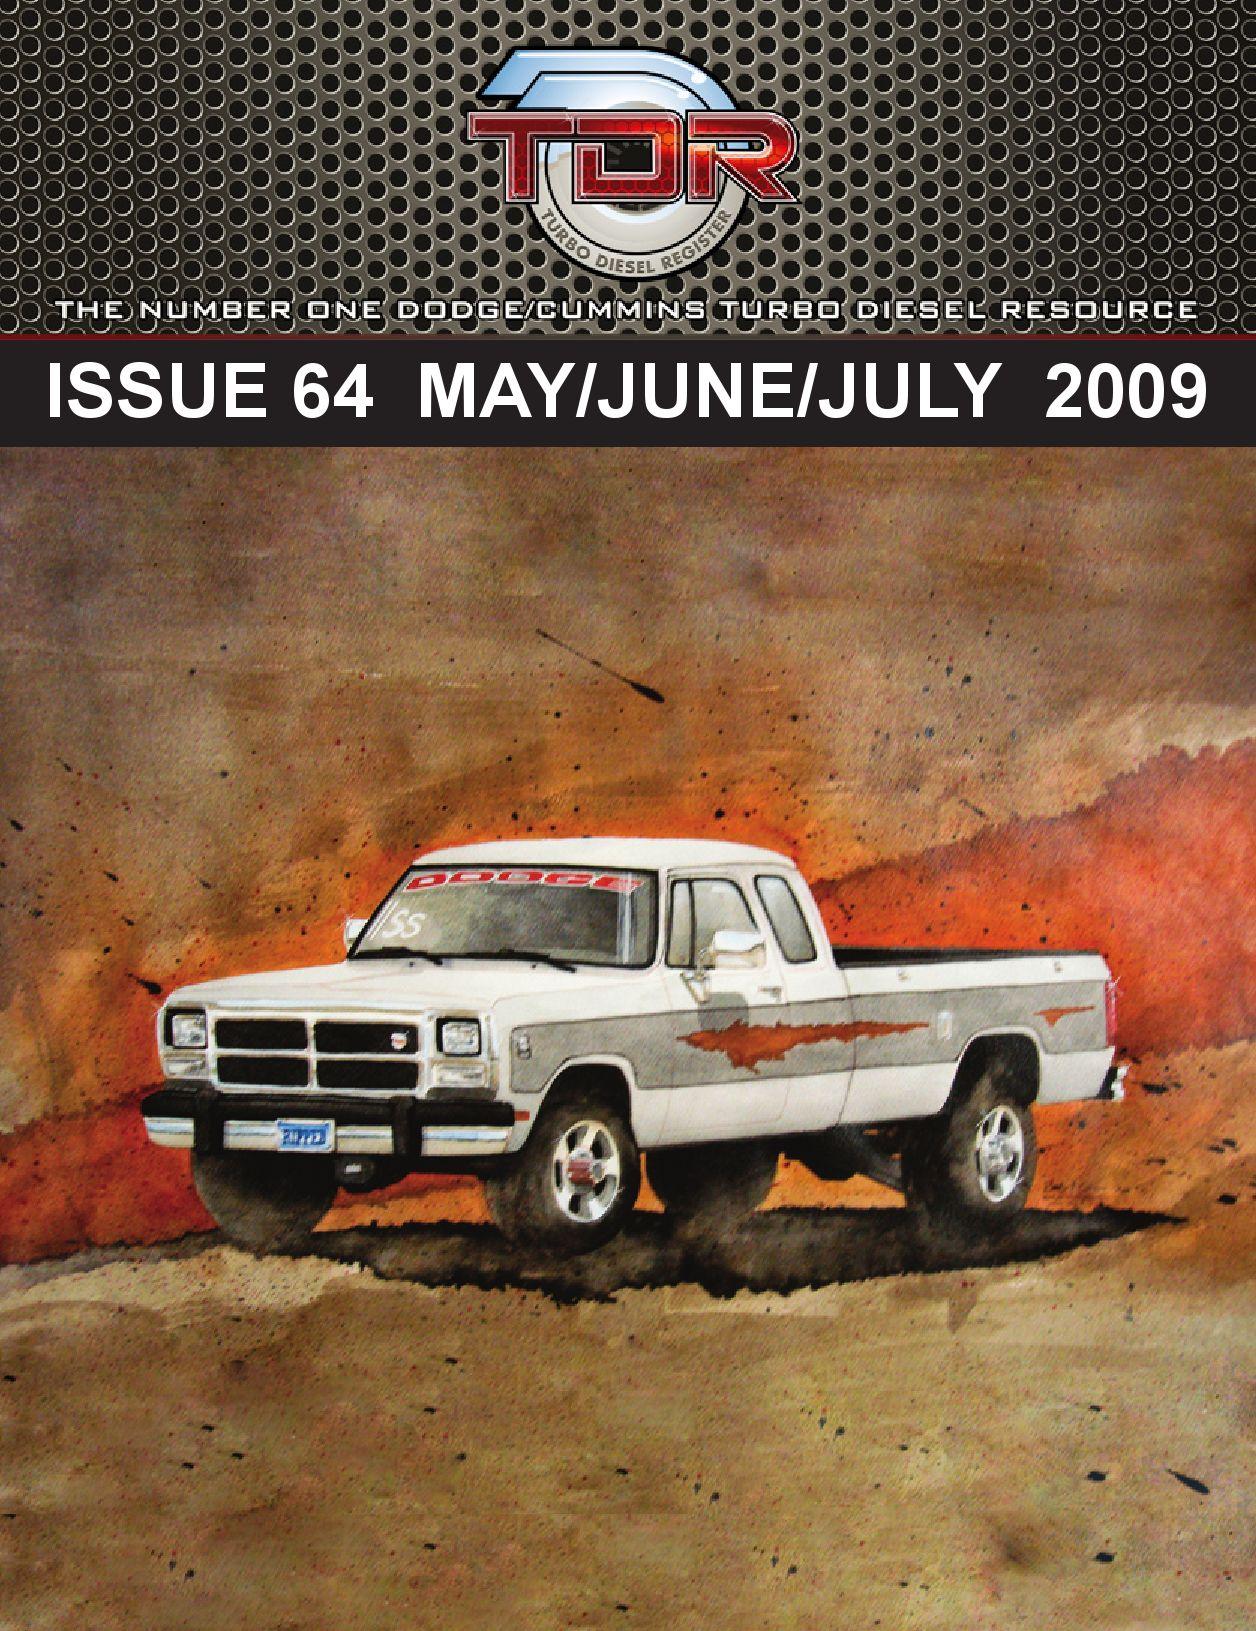 hight resolution of turbo diesel register issue 64